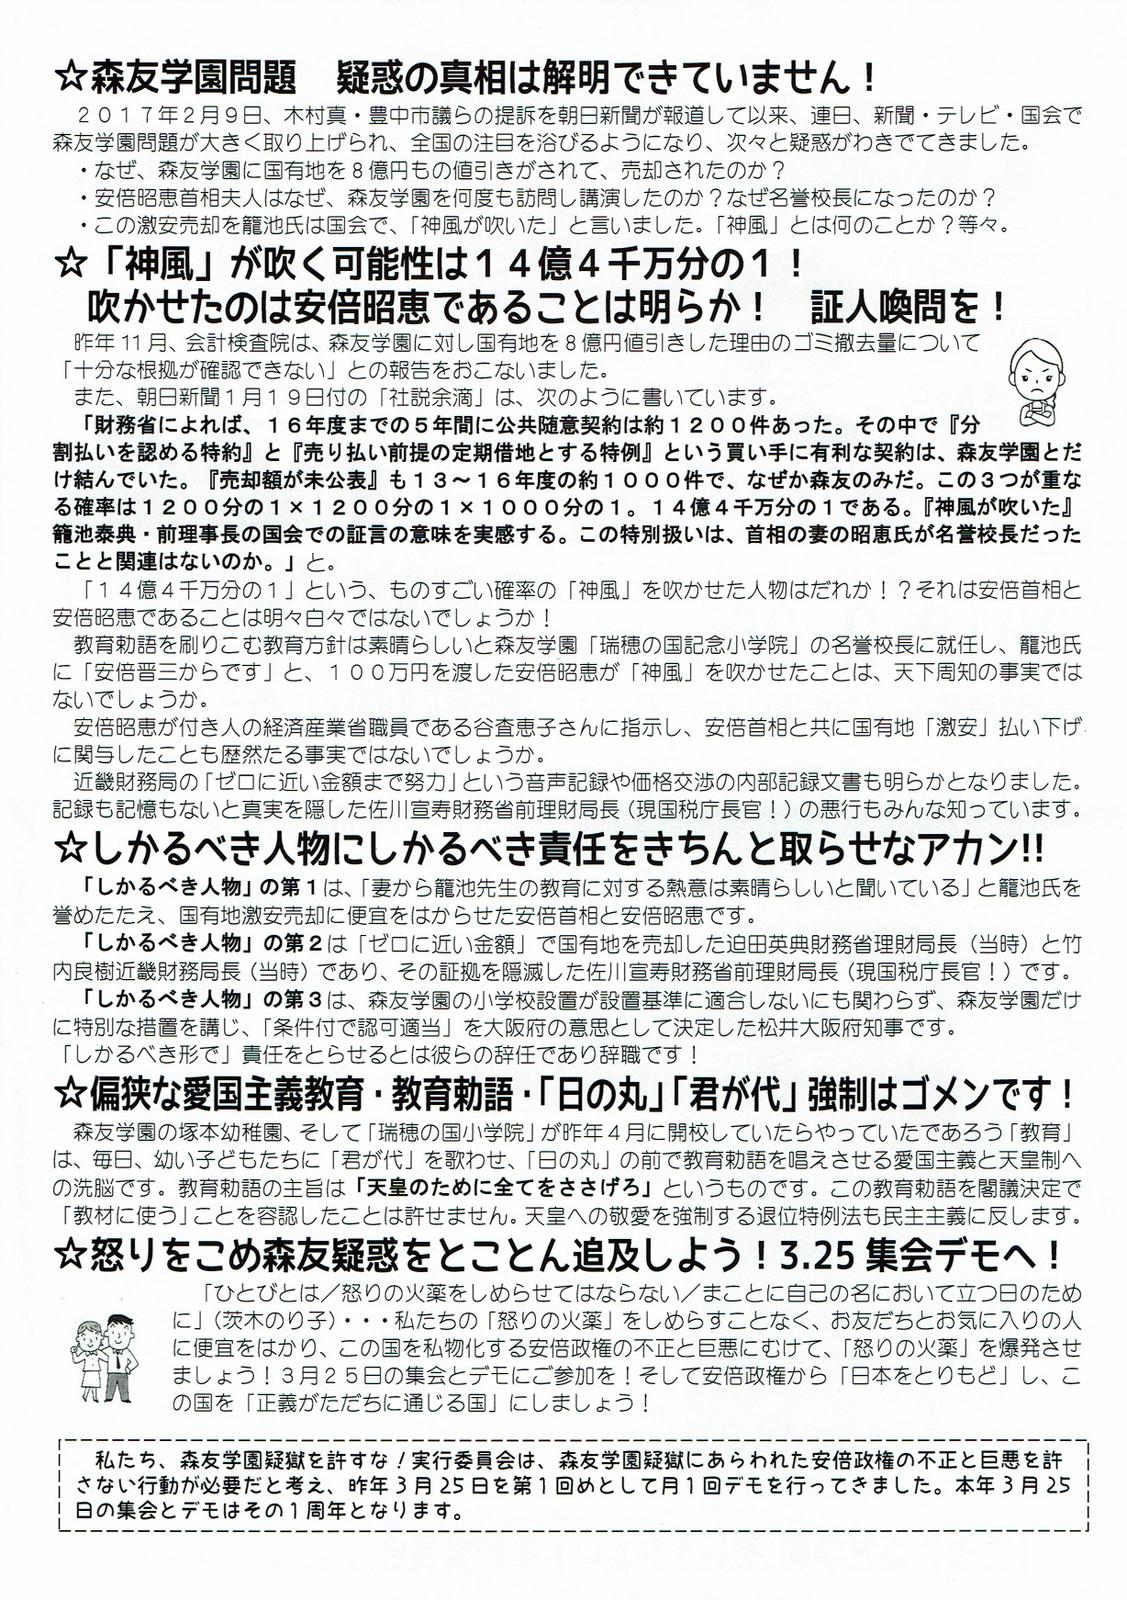 Cci_000057